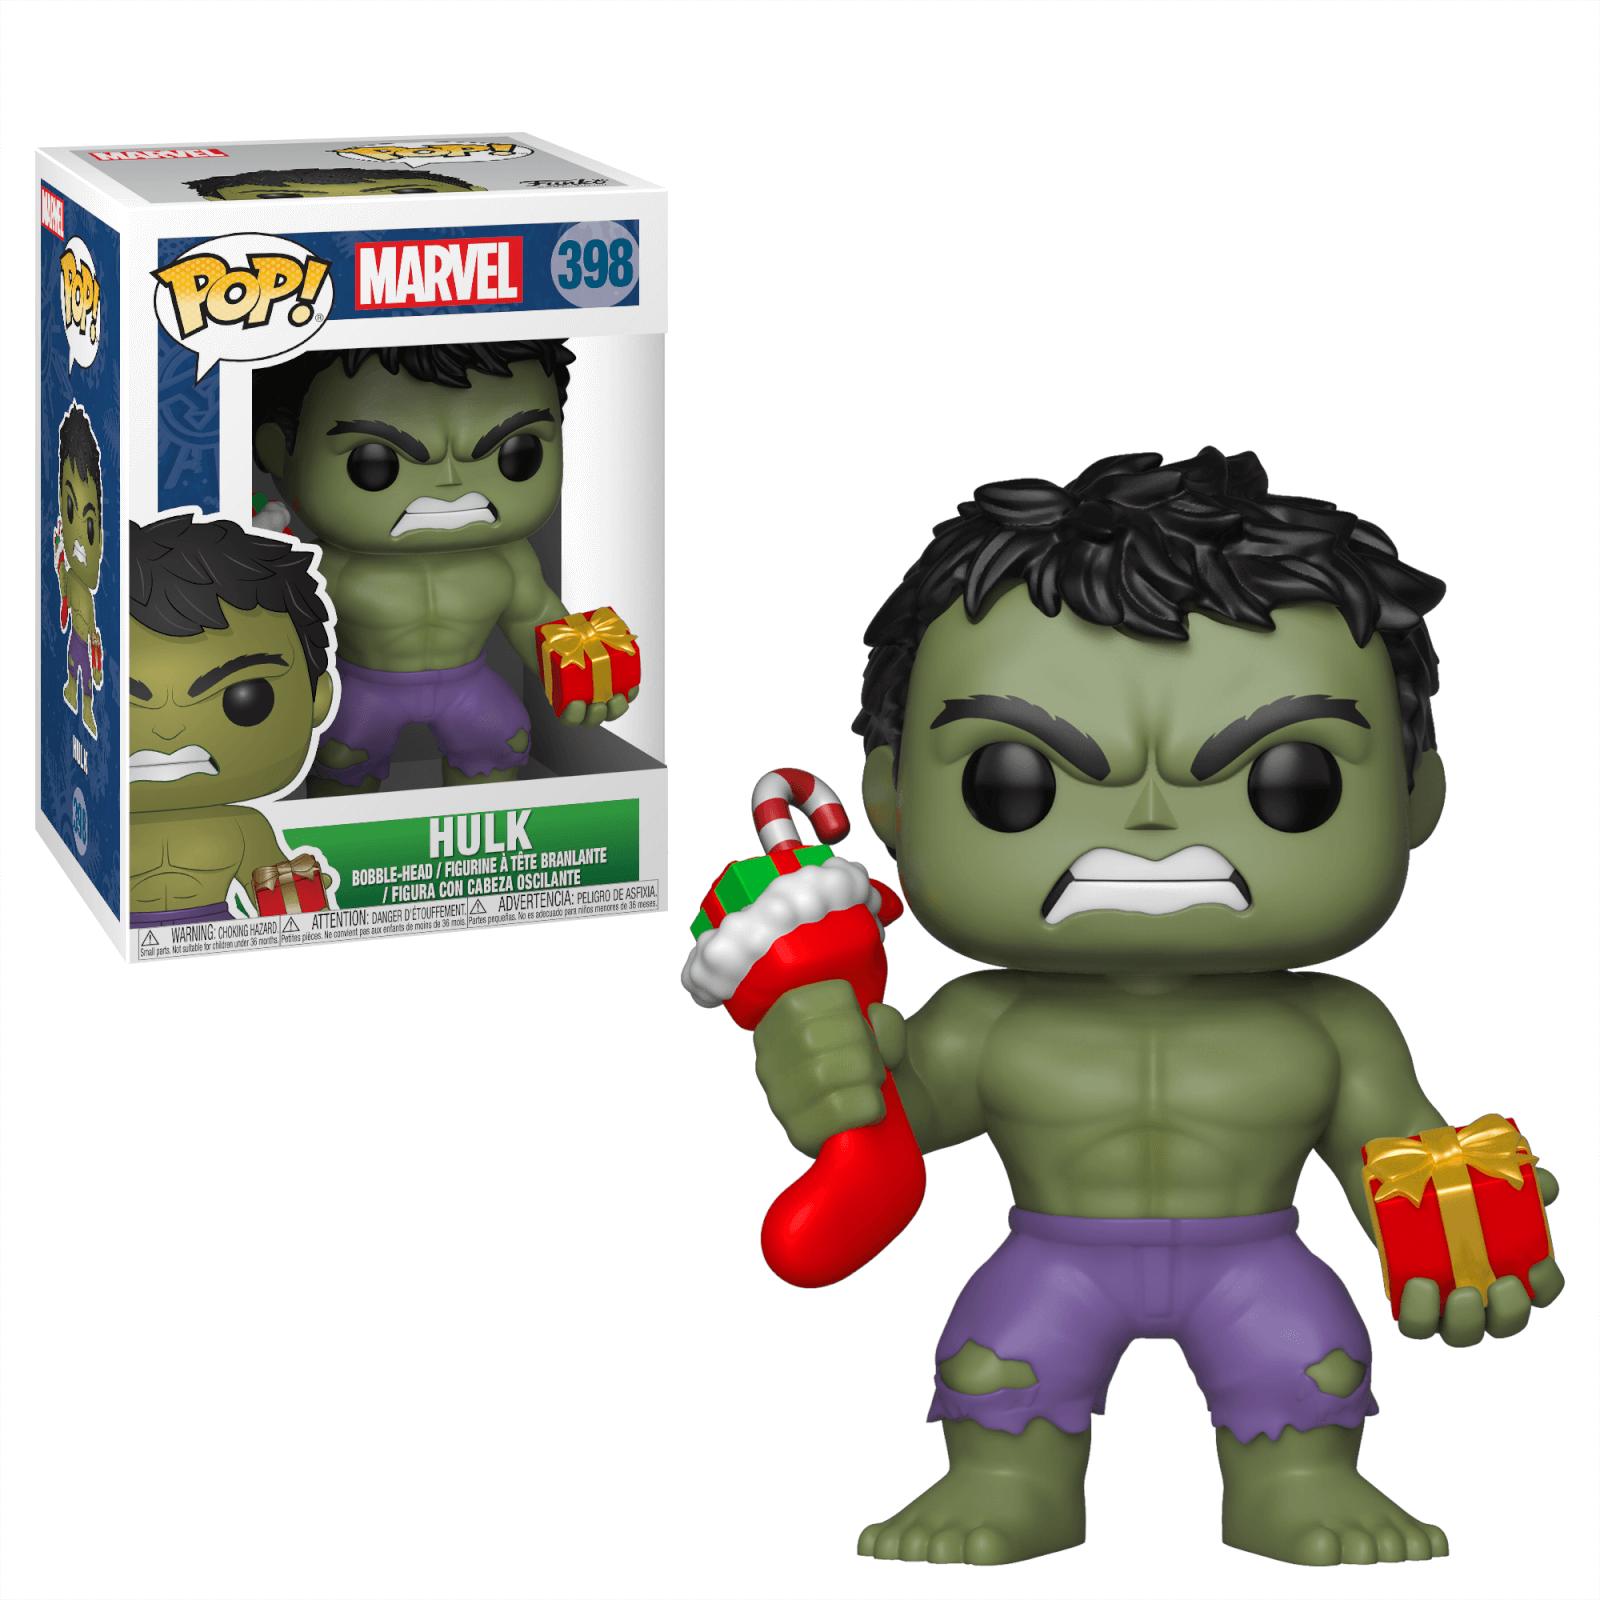 avengers bean bag chair 24 7 chairs figurines pop hulk avec cadeau et chaussette marvel